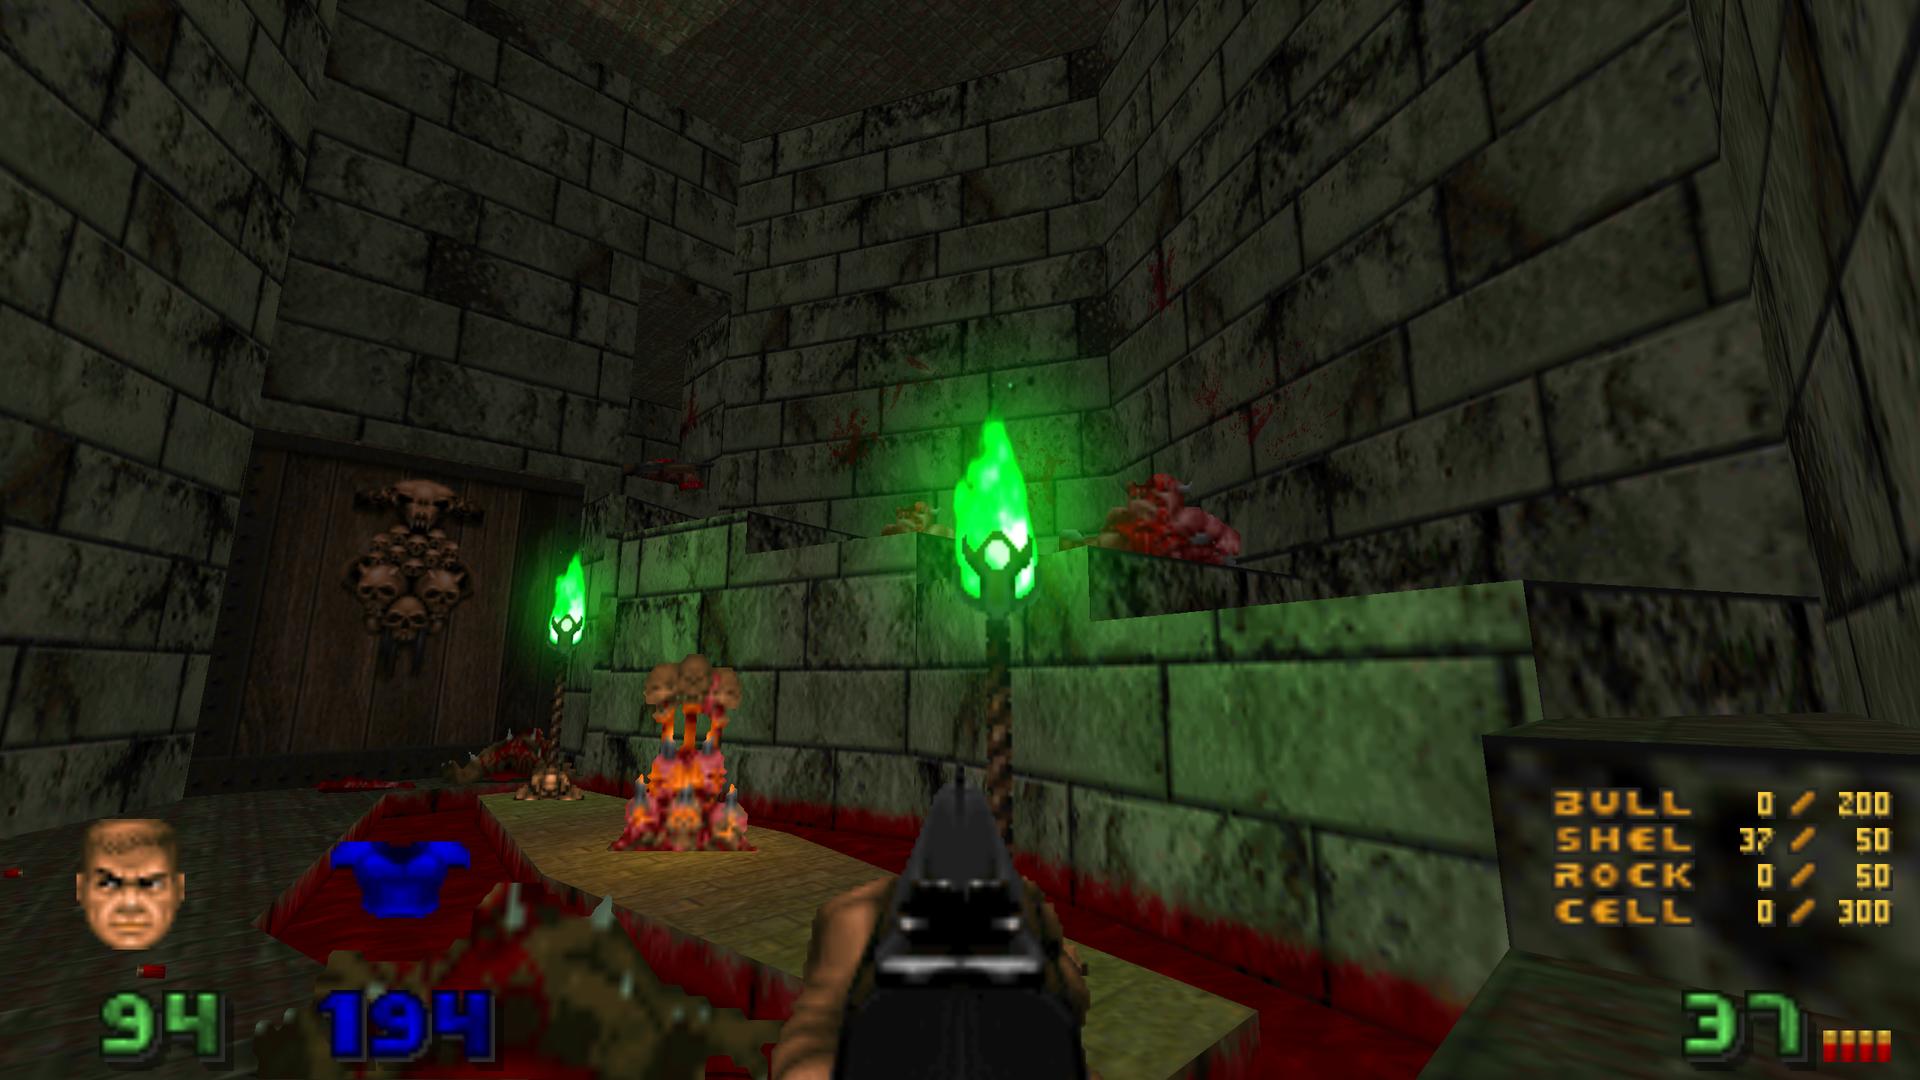 Screenshot_Doom_20201016_210525.png.9b5f424845894158ede712c928840bb2.png